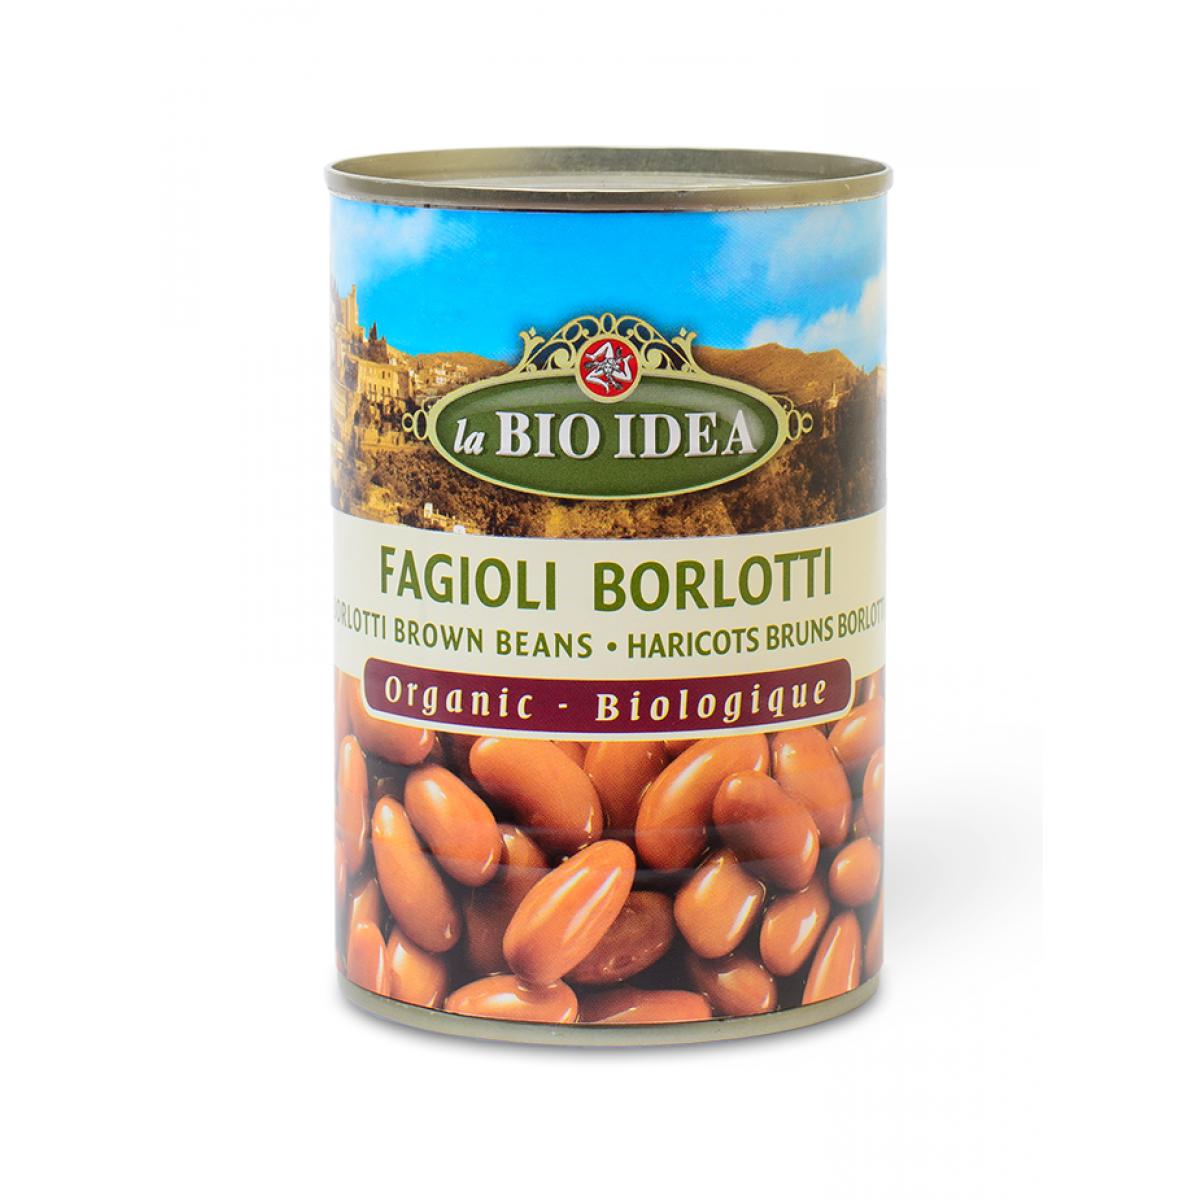 Bruine Berlotti Bonen